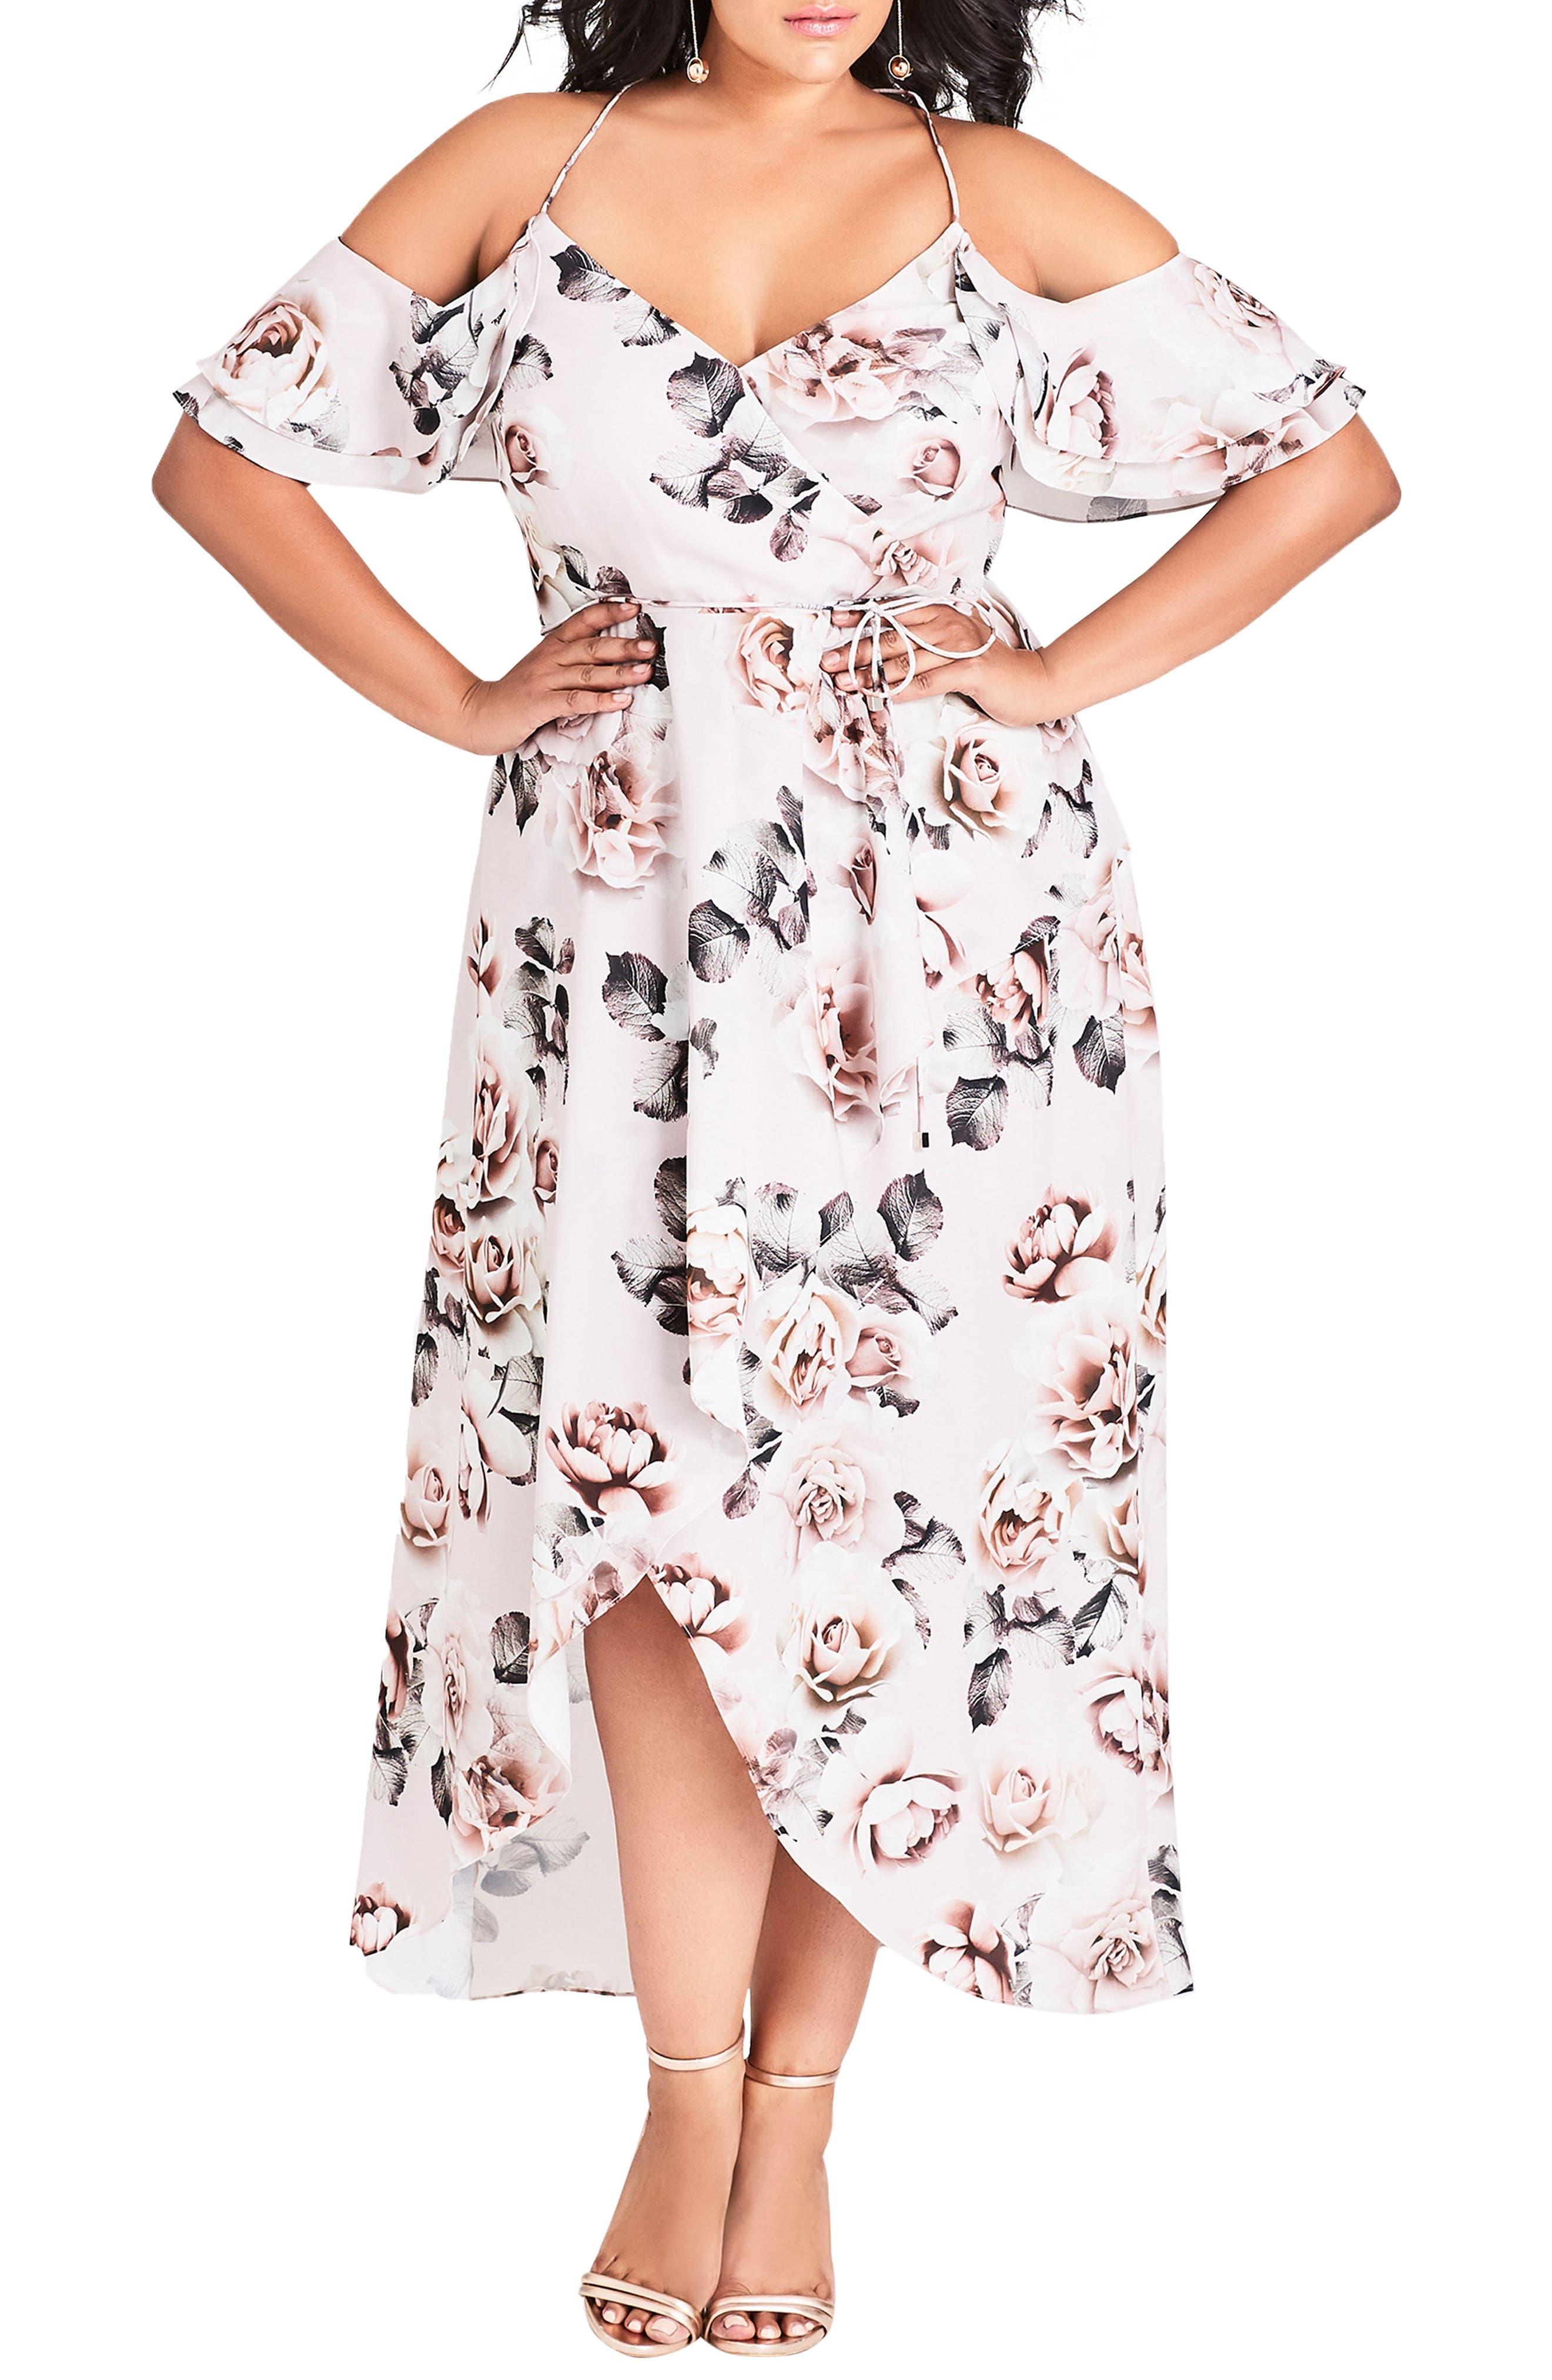 Plus Size City Chic Champagne Rose Cold Shoulder Maxi Dress, Brown